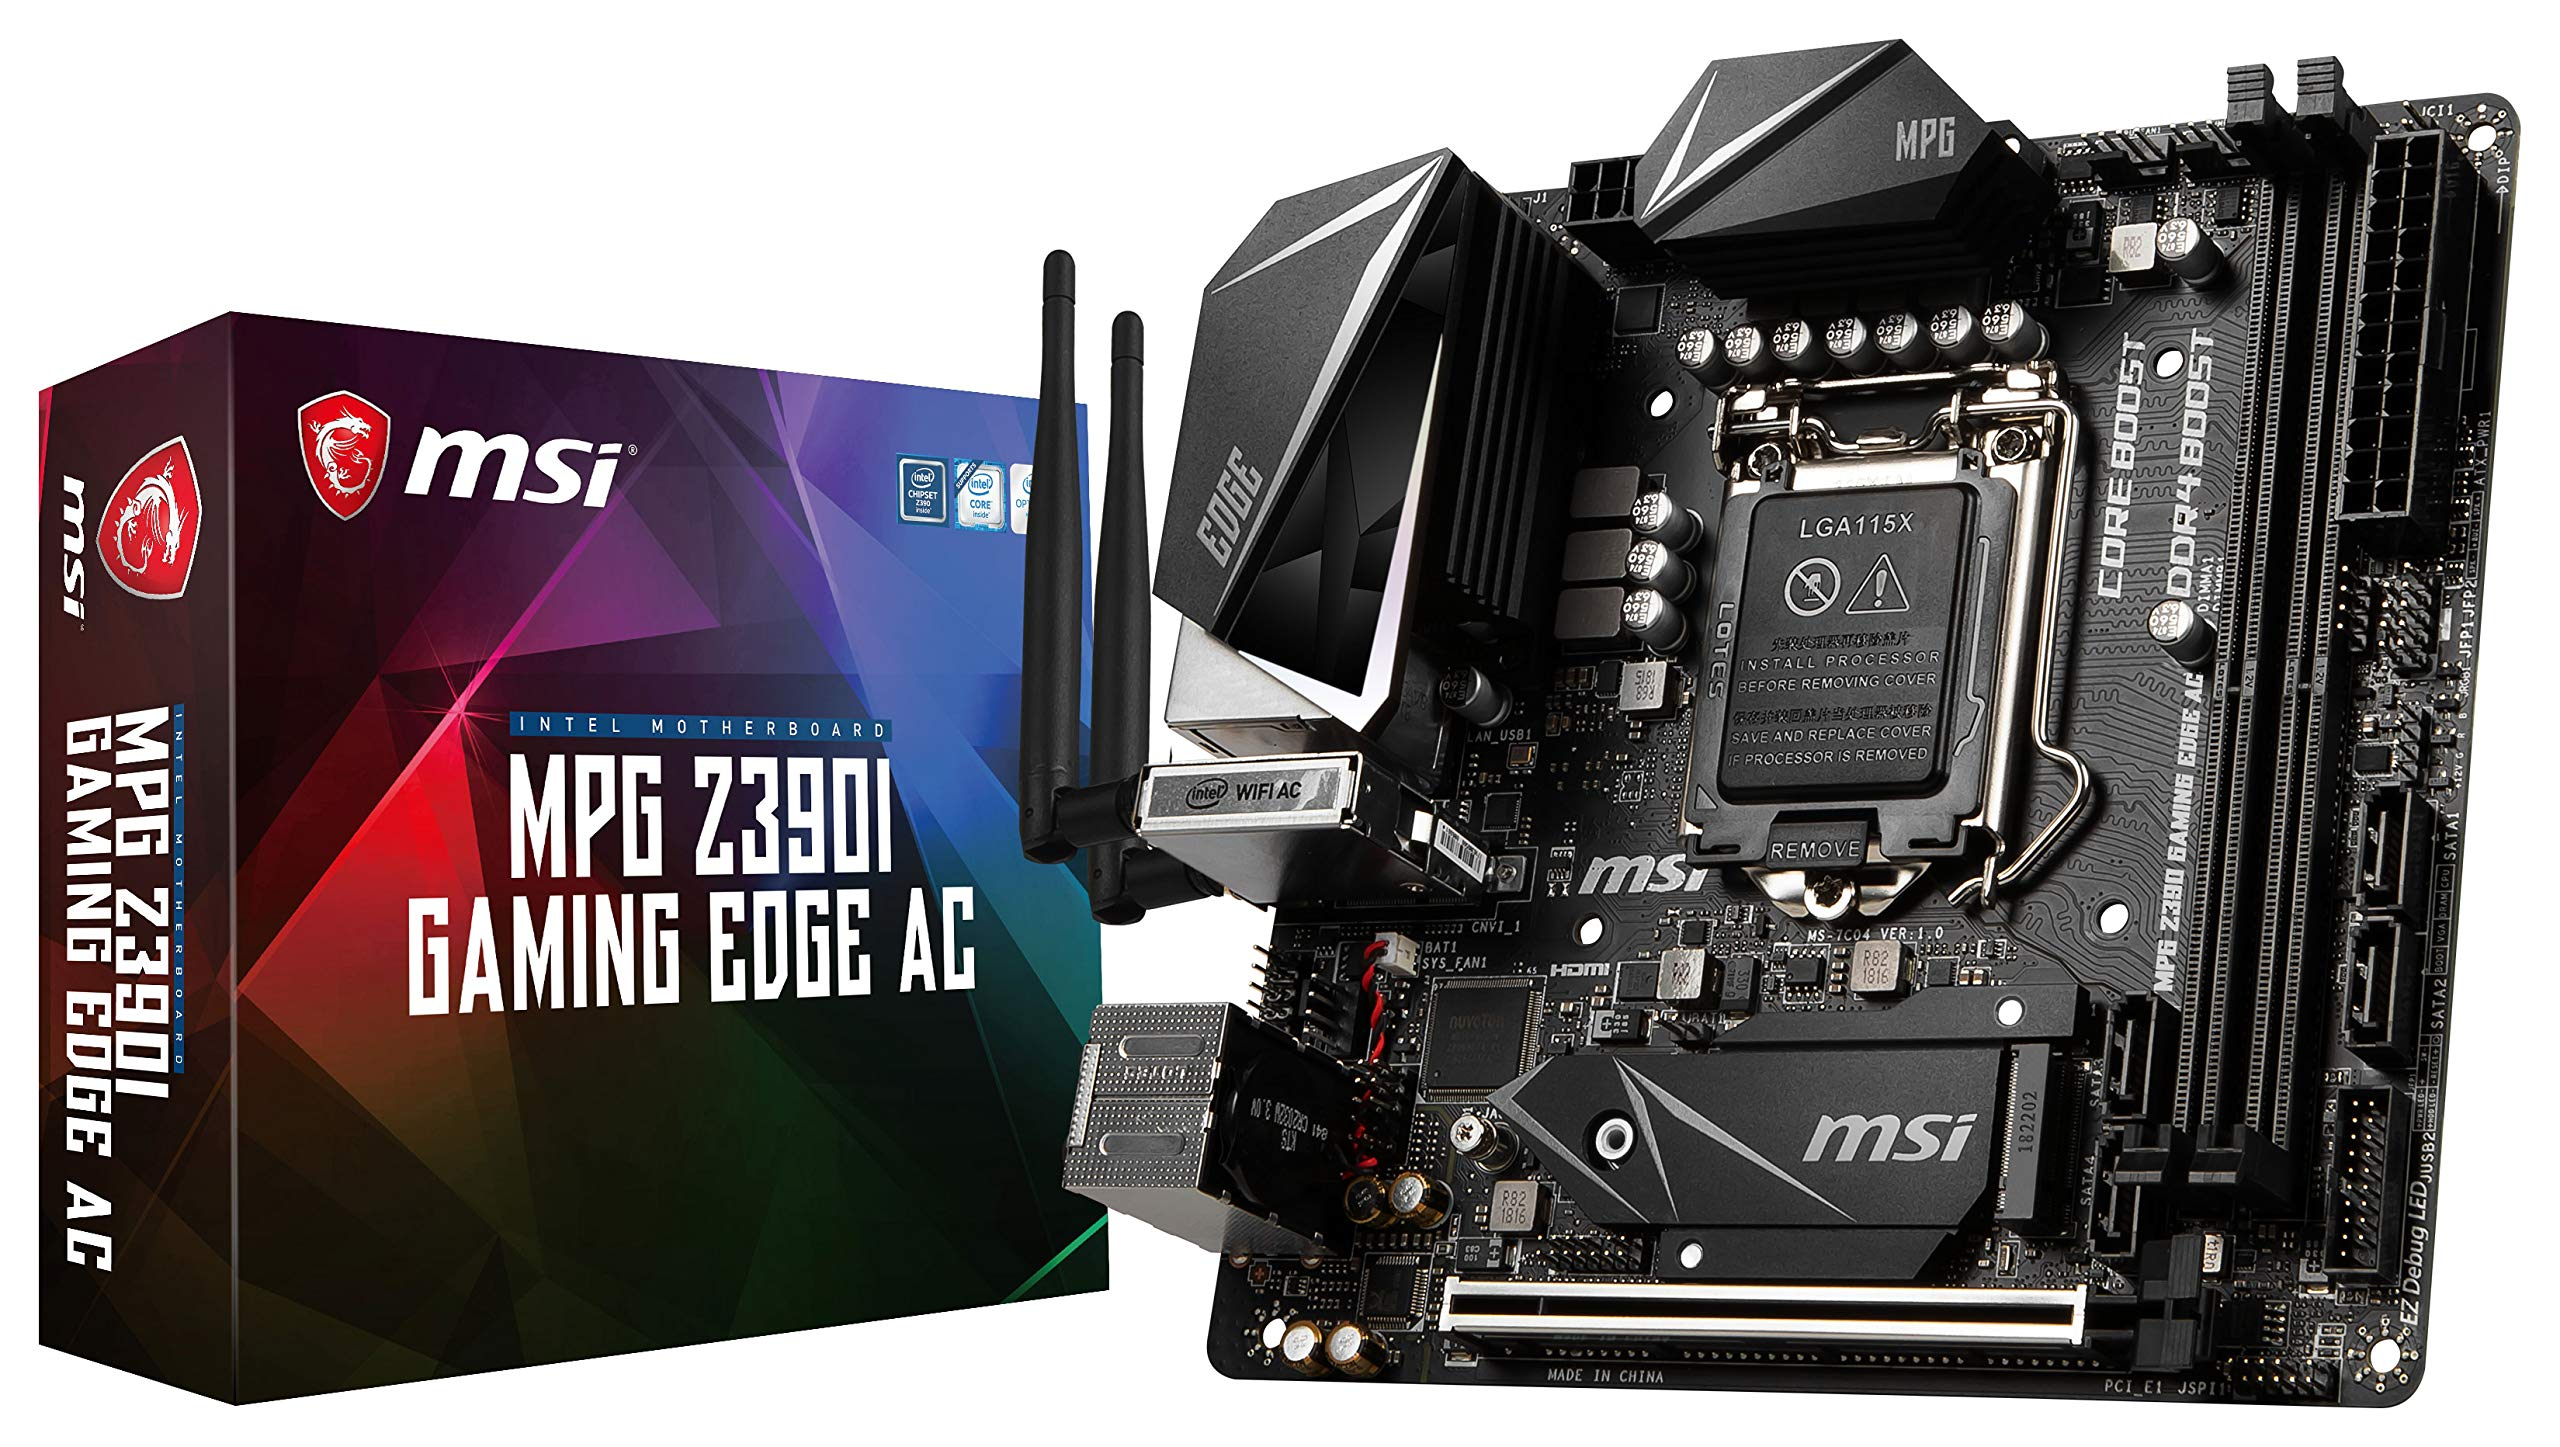 MSI MPG Z390I Gaming Edge AC LGA1151 (Intel 8th and 9th Gen) M.2 USB 3.1 Gen 2 DDR4 HDMI DP Wi-Fi Mini ITX Z390 Gaming Motherboard